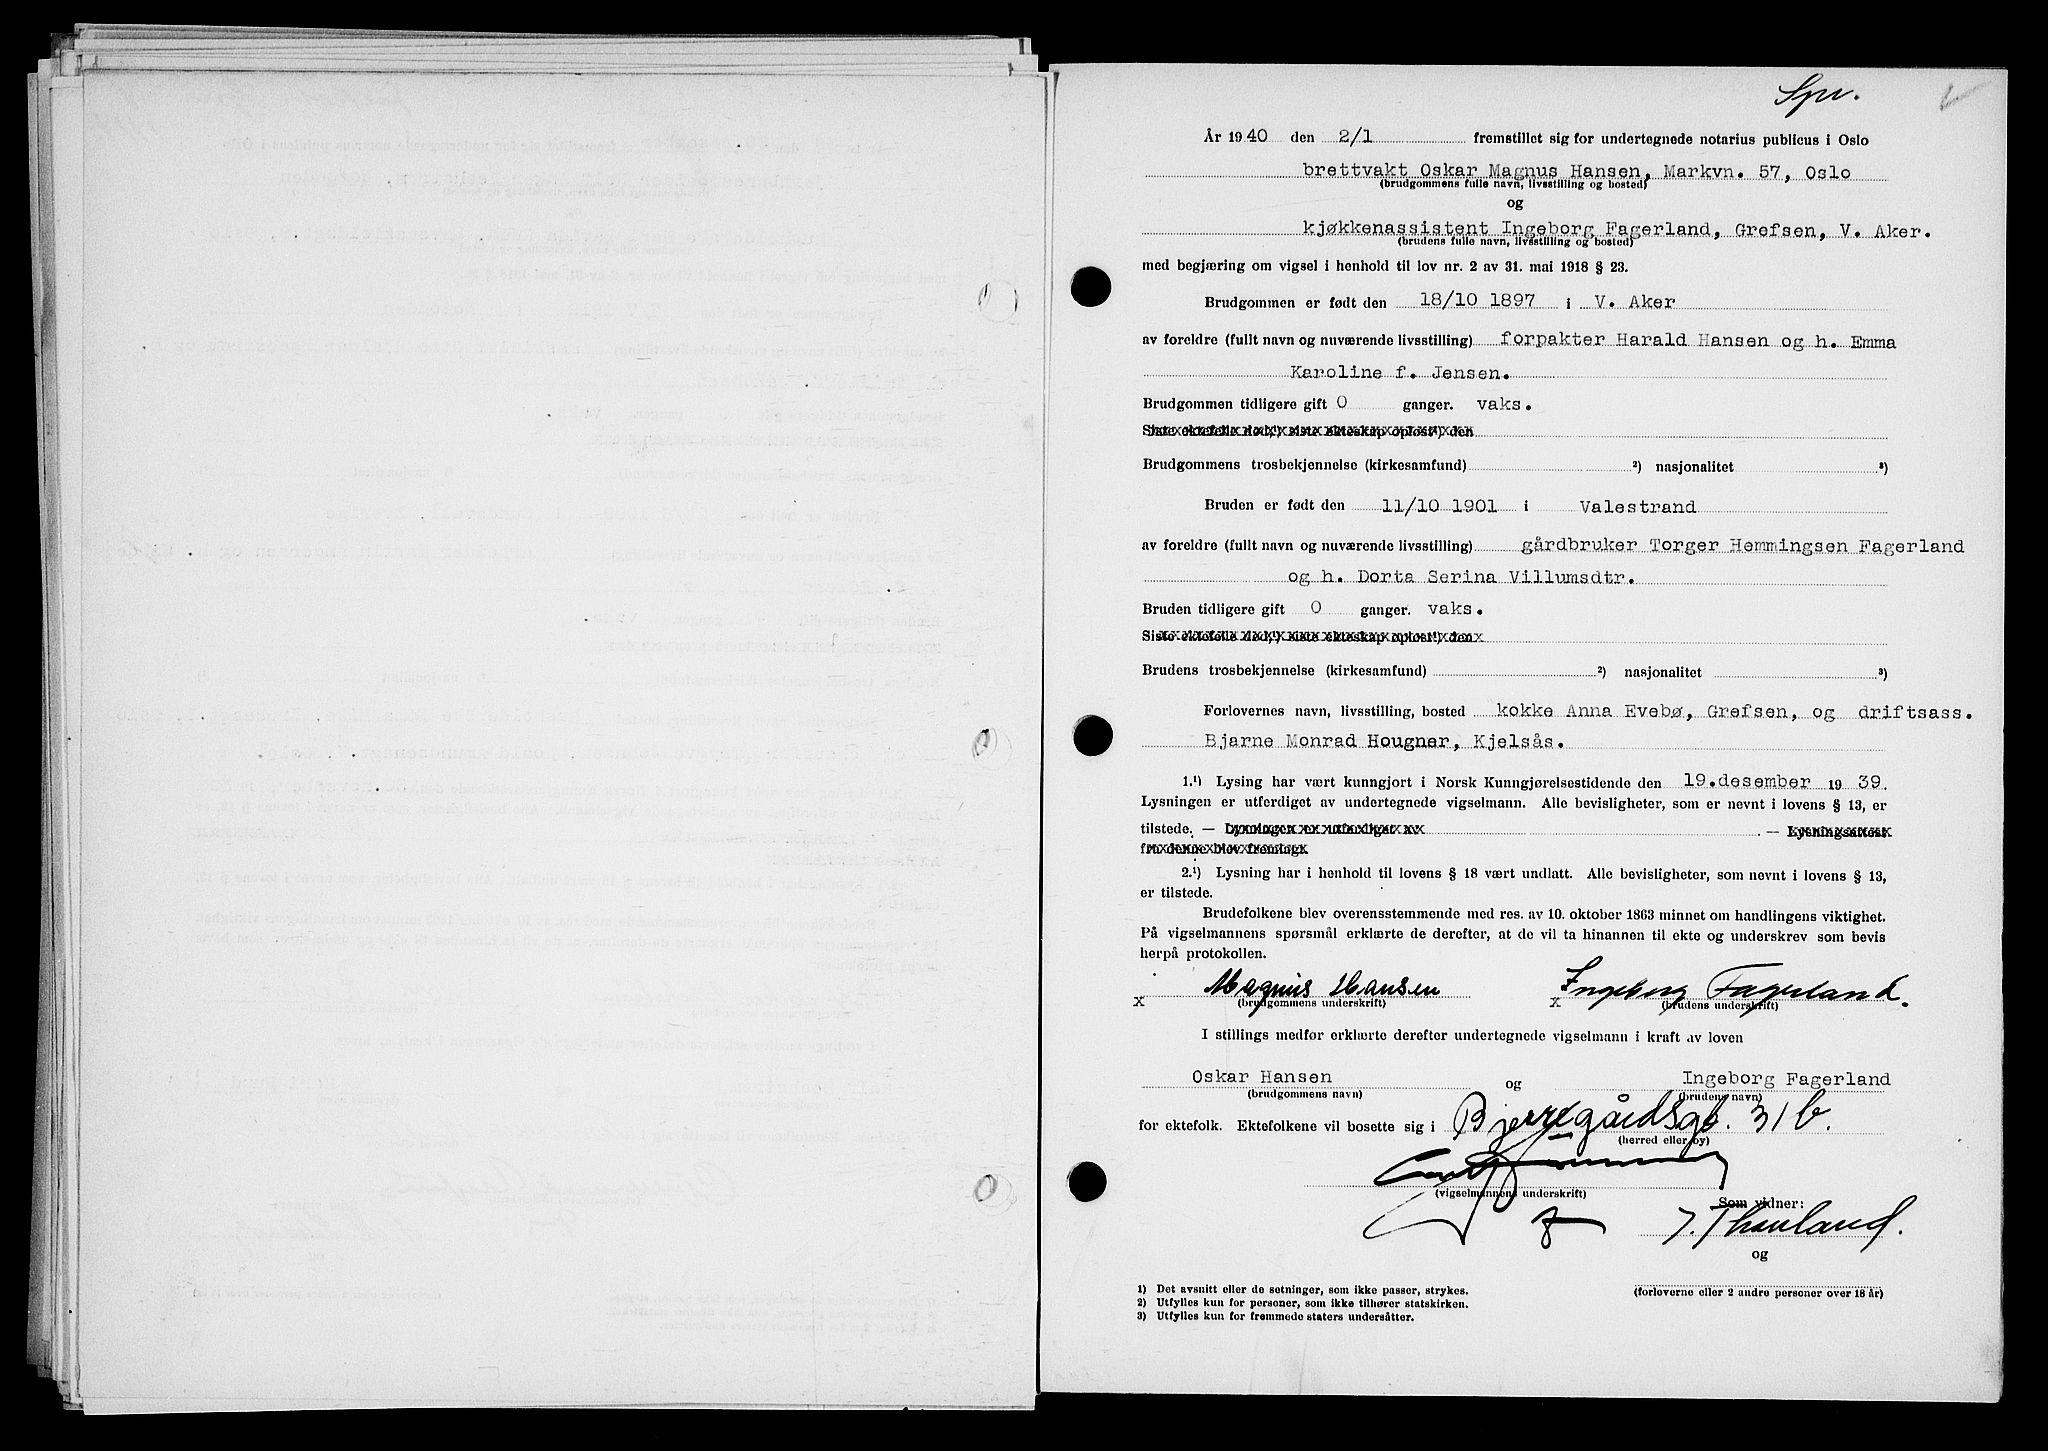 SAO, Oslo byfogd avd. I, L/Lb/Lbb/L0033: Notarialprotokoll, rekke II: Vigsler, 1939-1940, s. upaginert